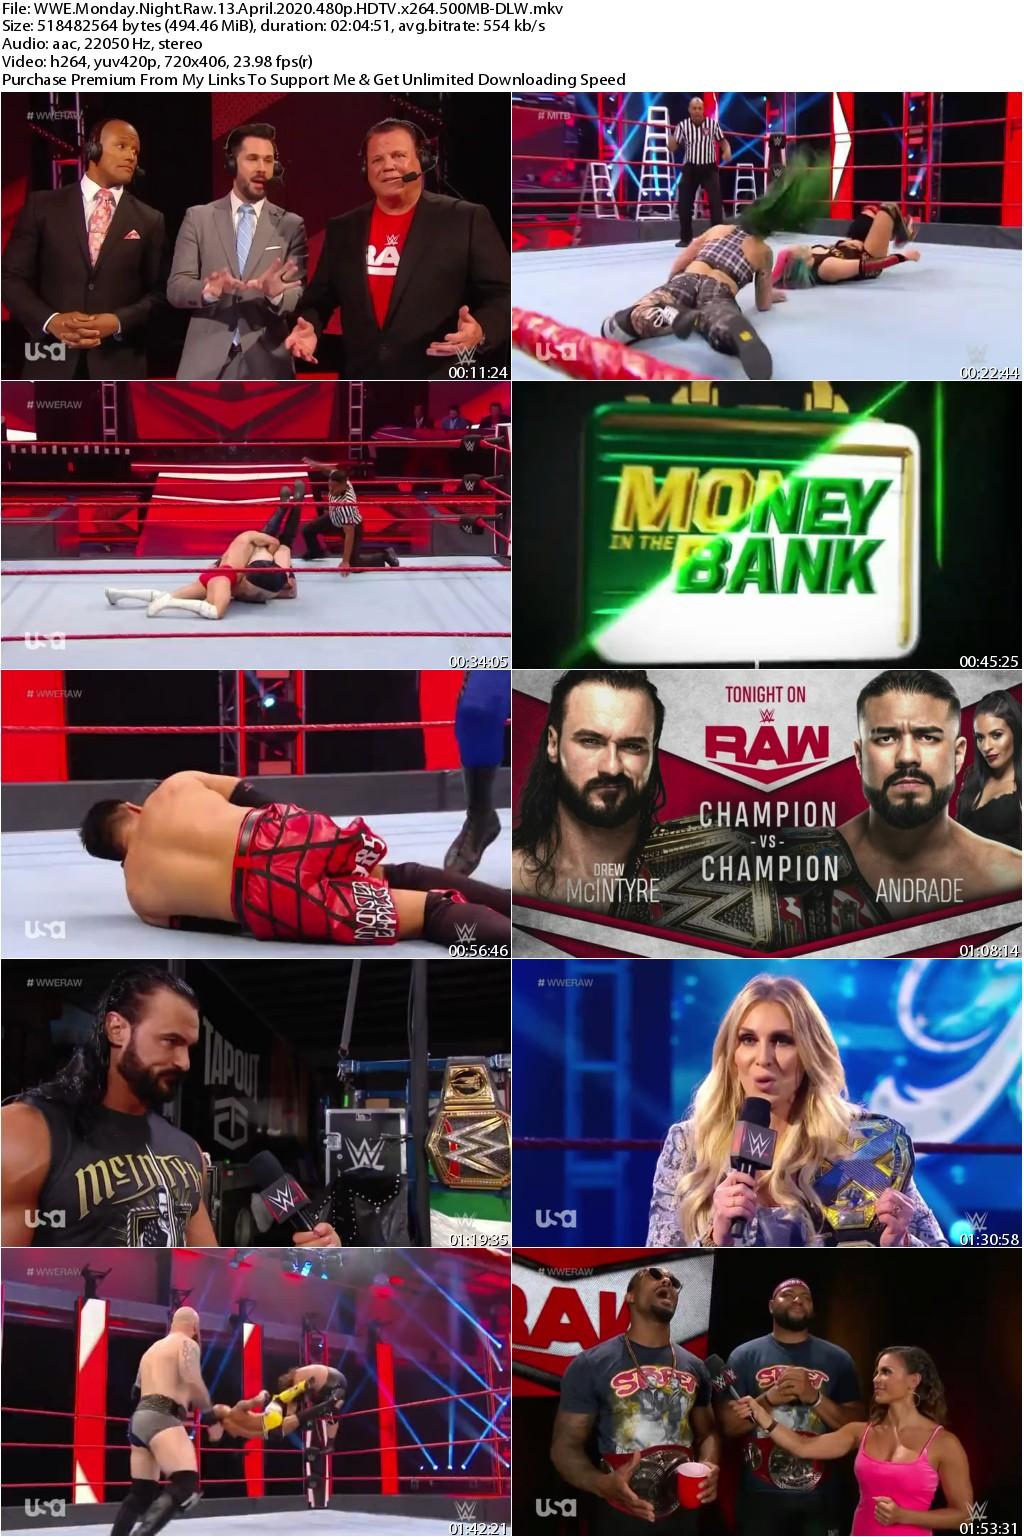 WWE Monday Night Raw 13 April 2020 480p HDTV x264 500MB-DLW